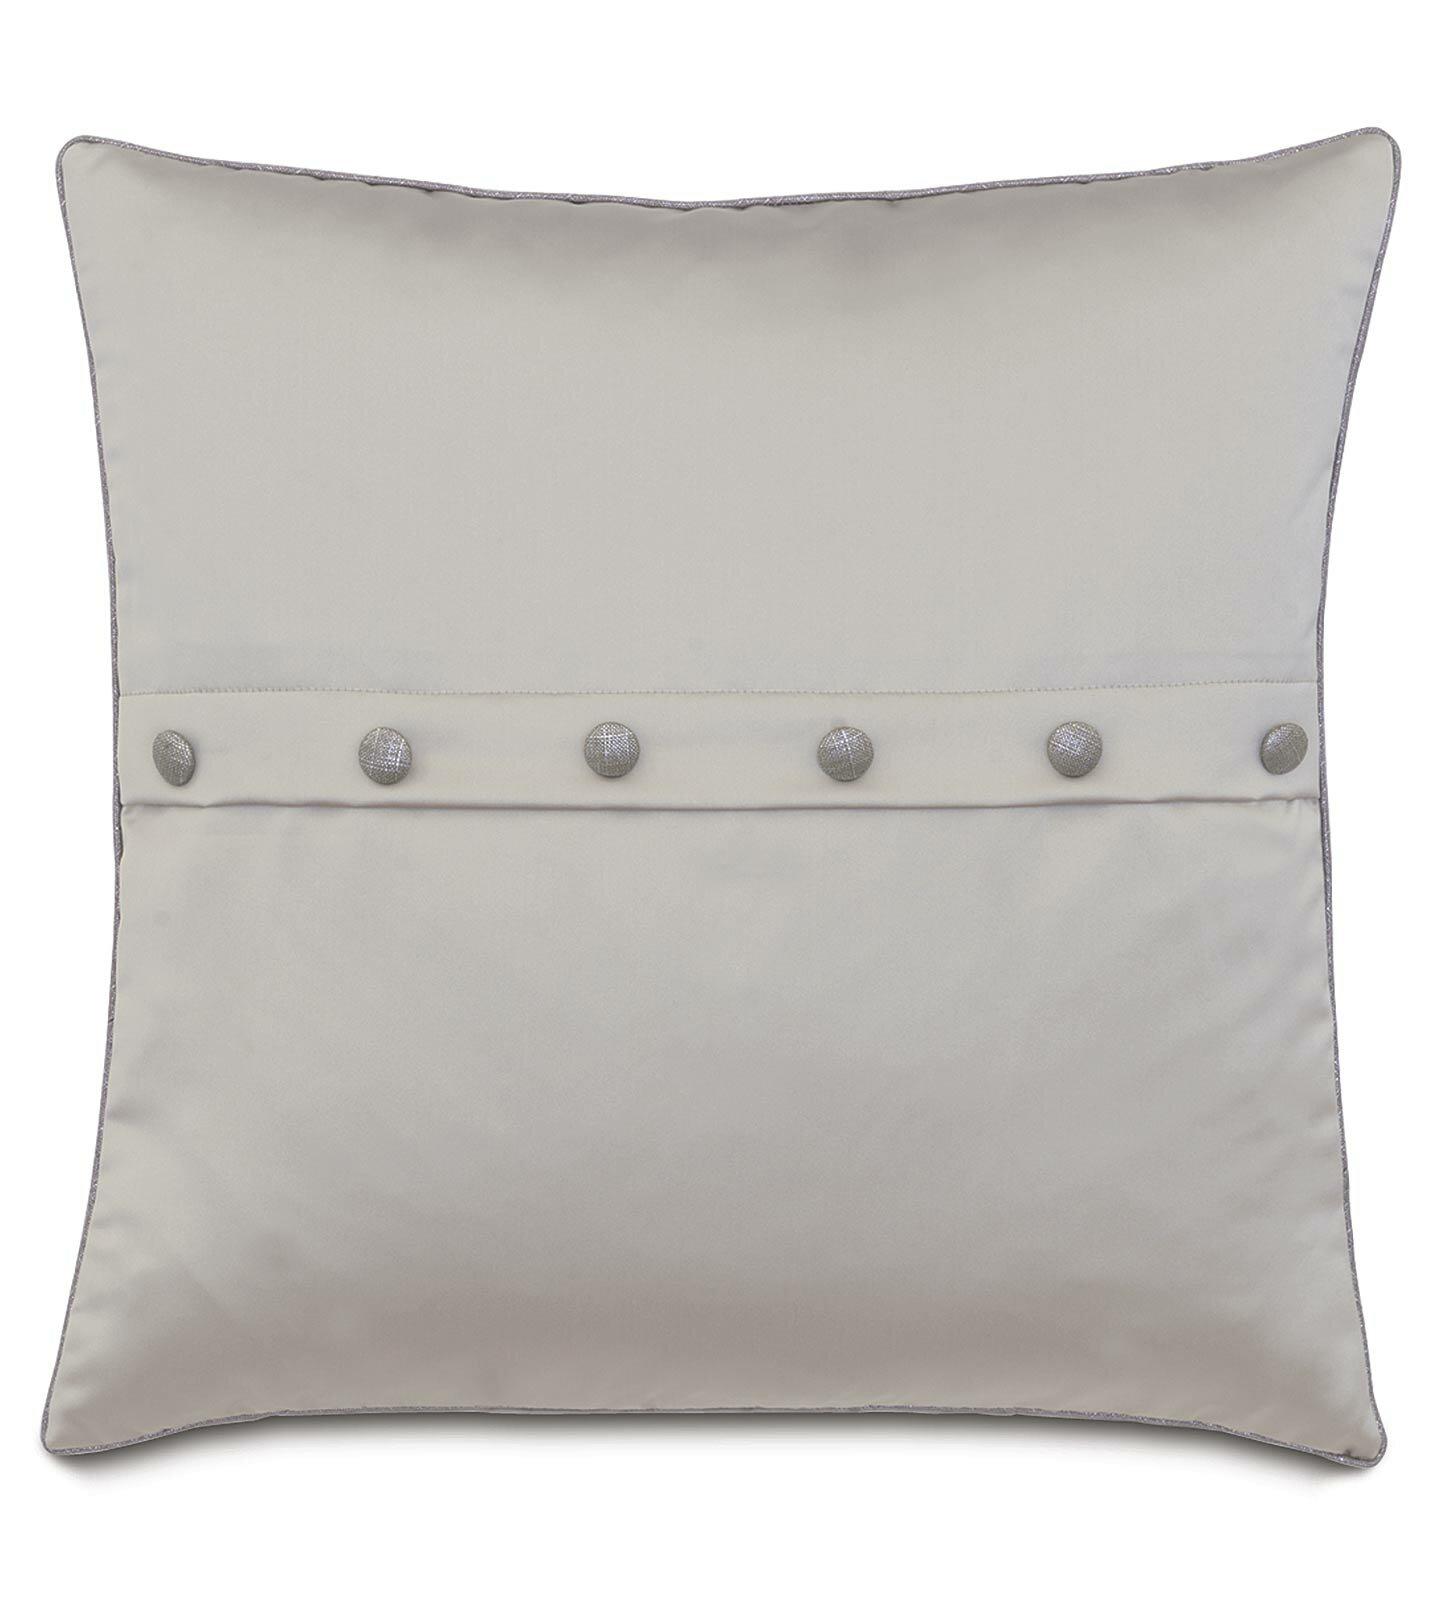 Eastern Accents Amal Throw Pillow Wayfair